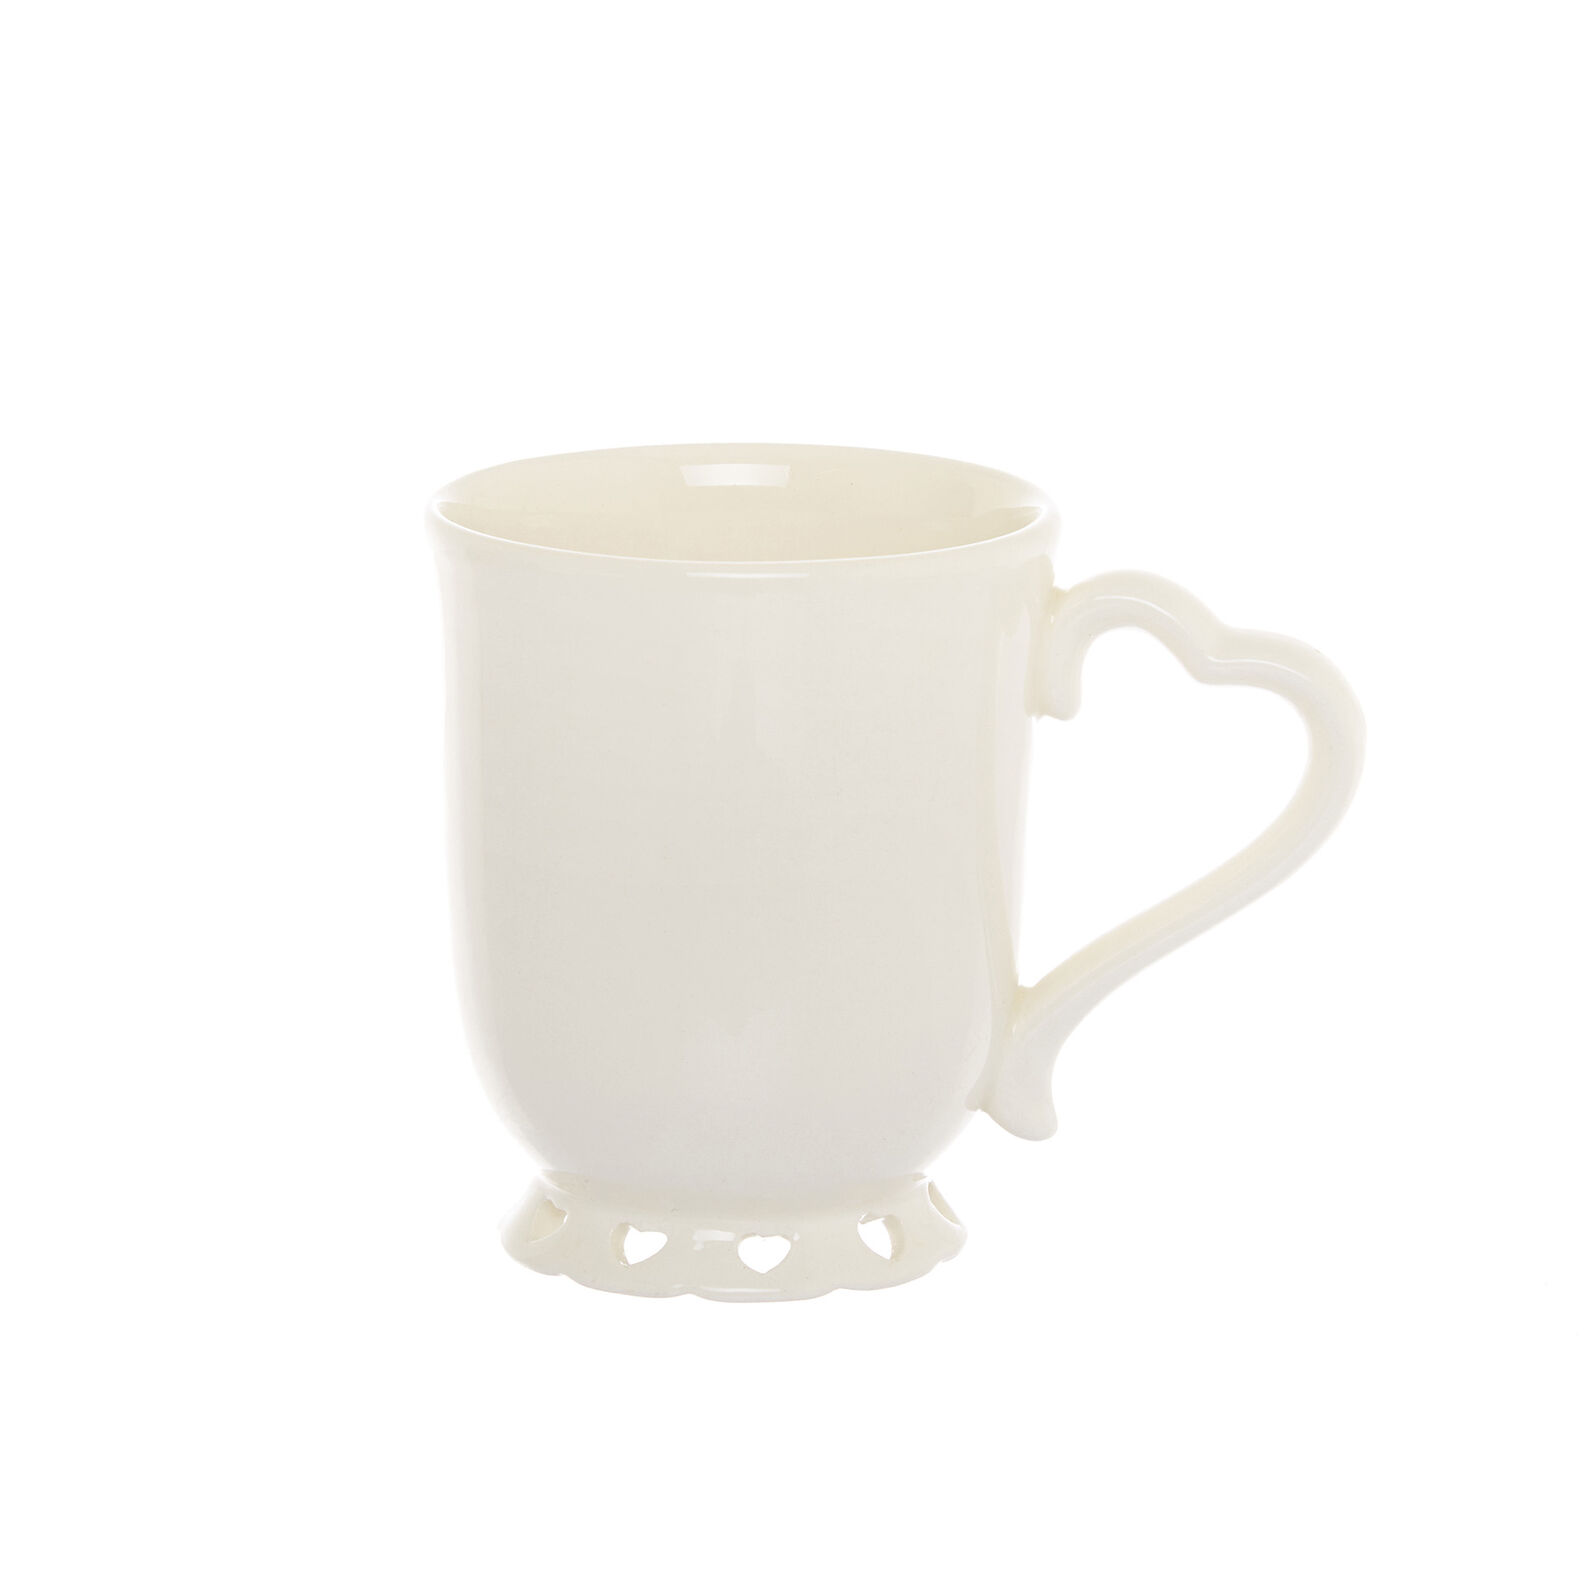 Ceramic mug with openwork heart design